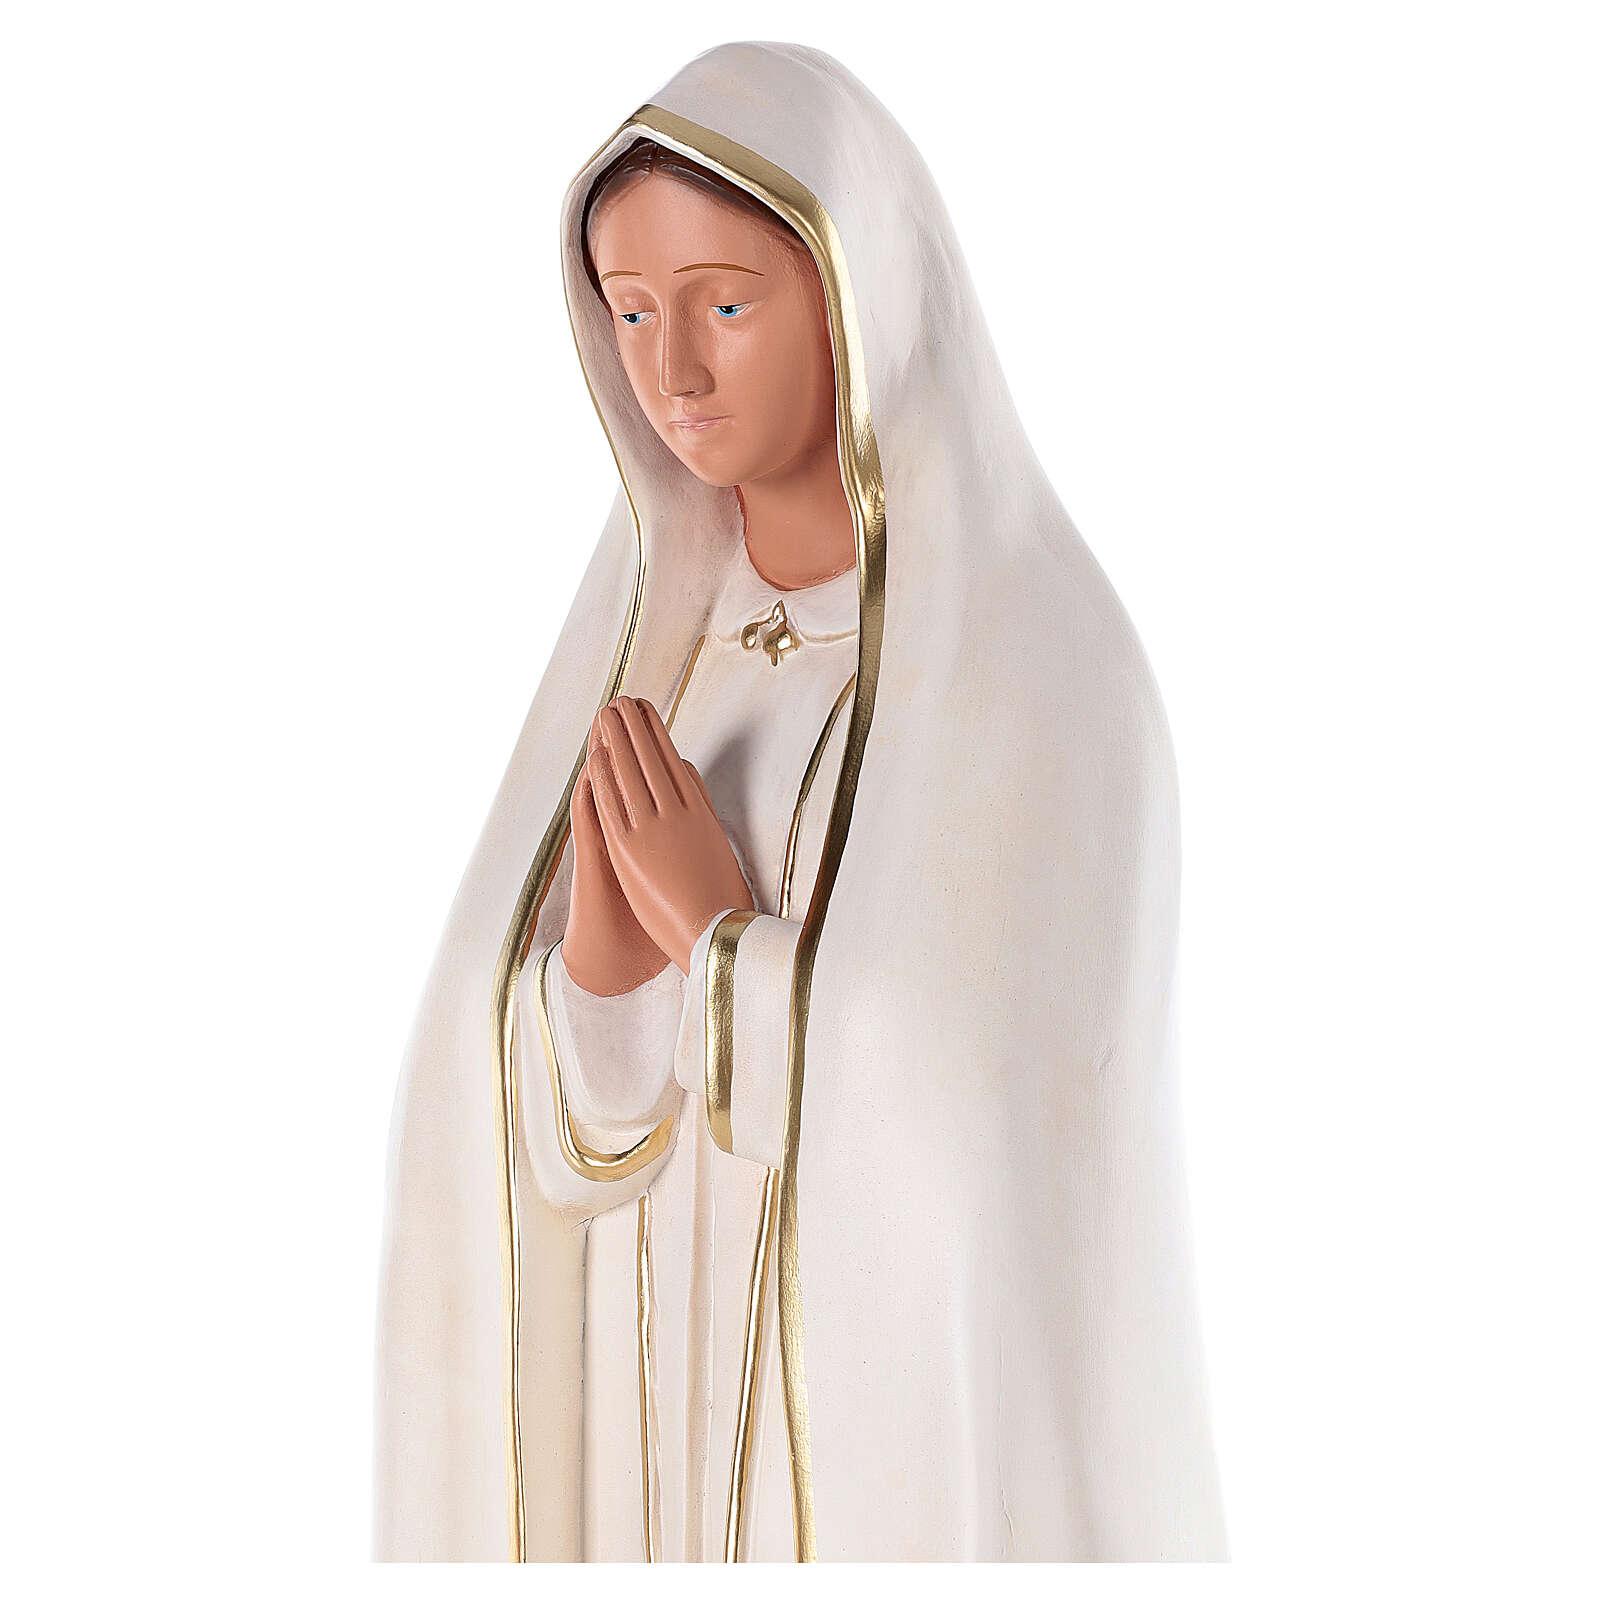 Estatua Virgen de Fátima 80 cm yeso pintado a mano Barsanti 4